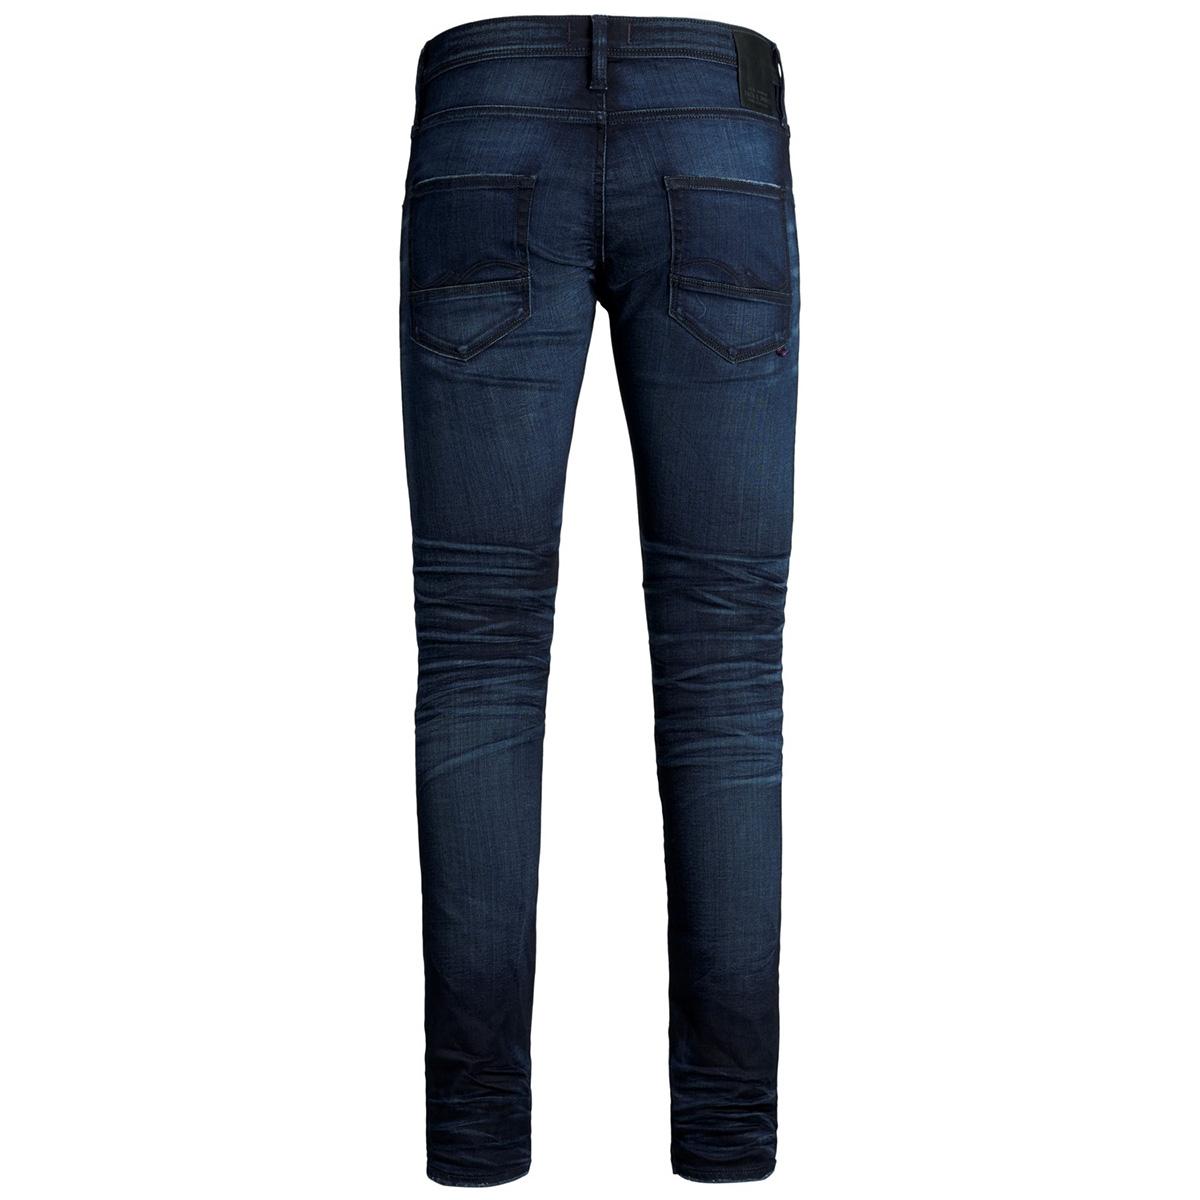 jjiglenn jjfox am 892 noos 12160112 jack & jones jeans blue denim